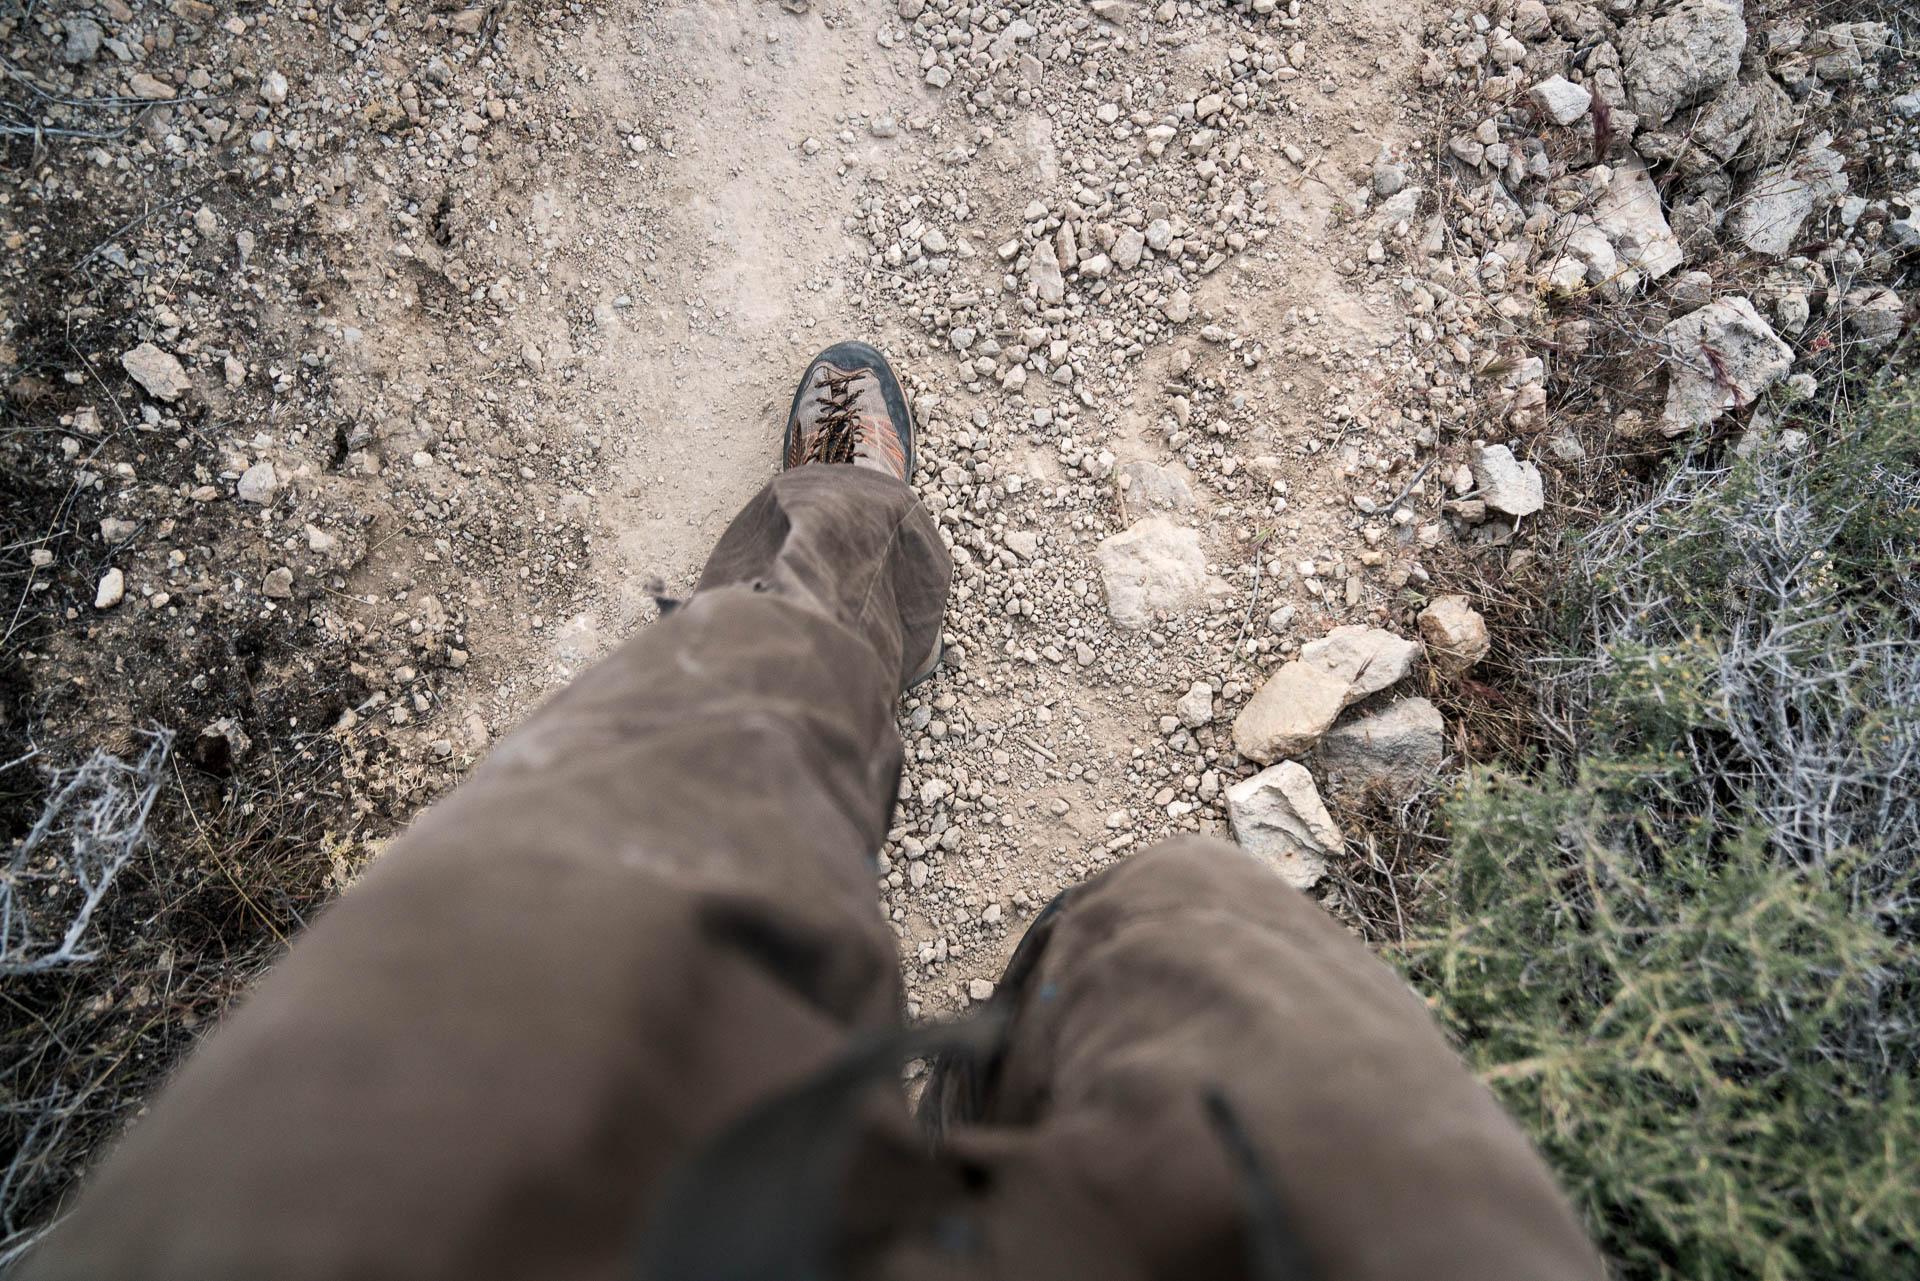 hiking legs